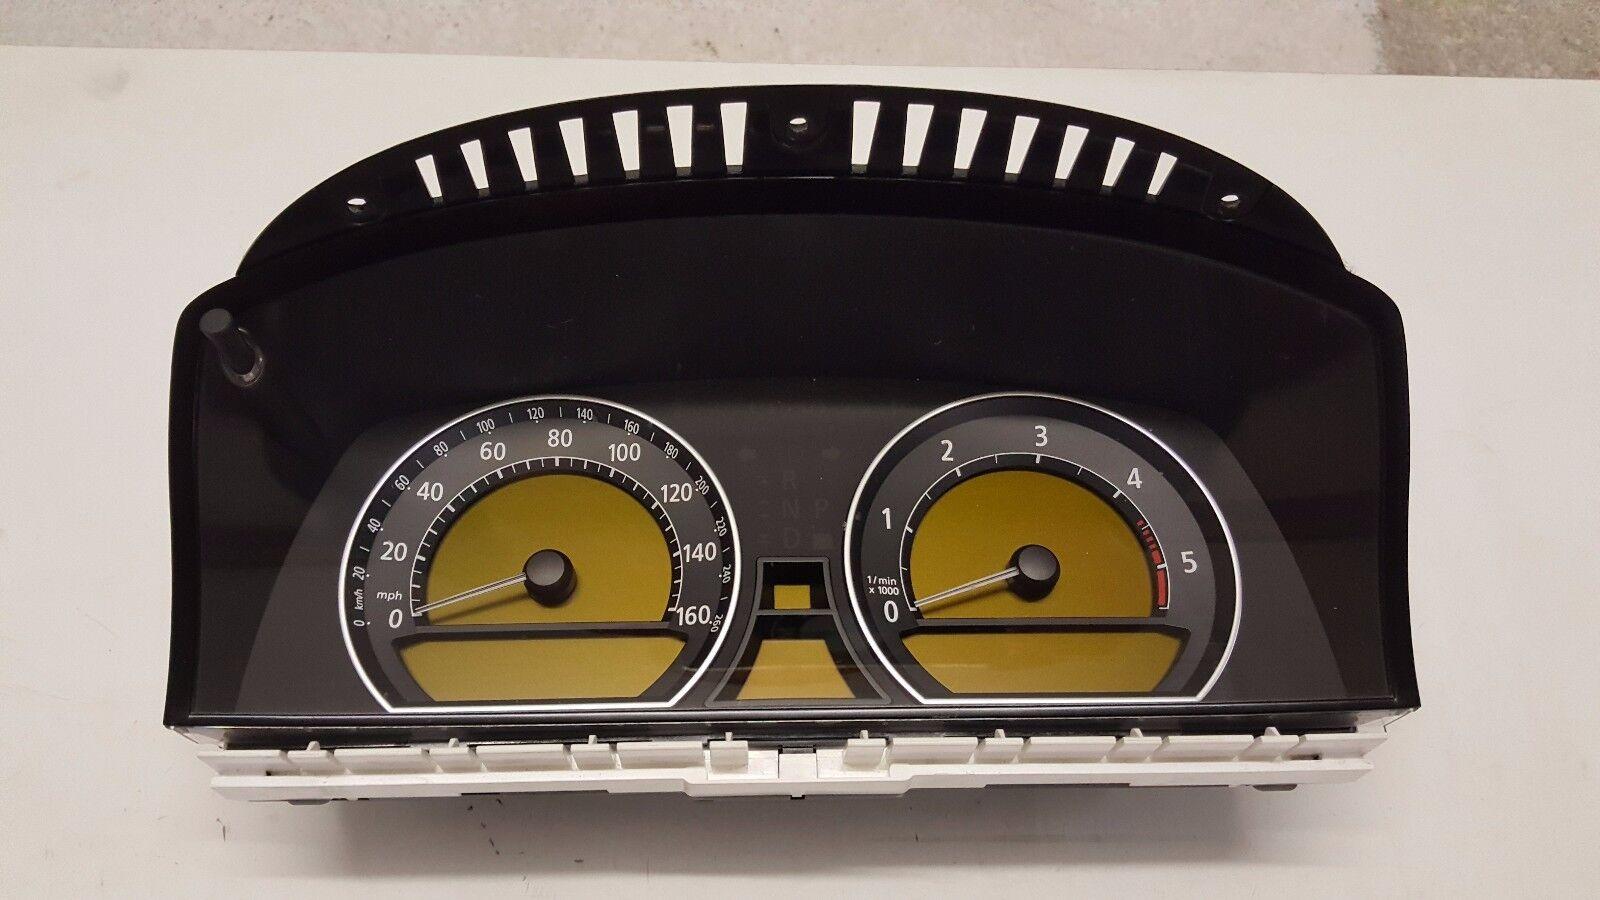 Bmw 730d E65 Instrument Cluster Speedometer Odometer Speedo 6211 Speedometers Gps Speed Sensor Vdo Norton Secured Powered By Verisign